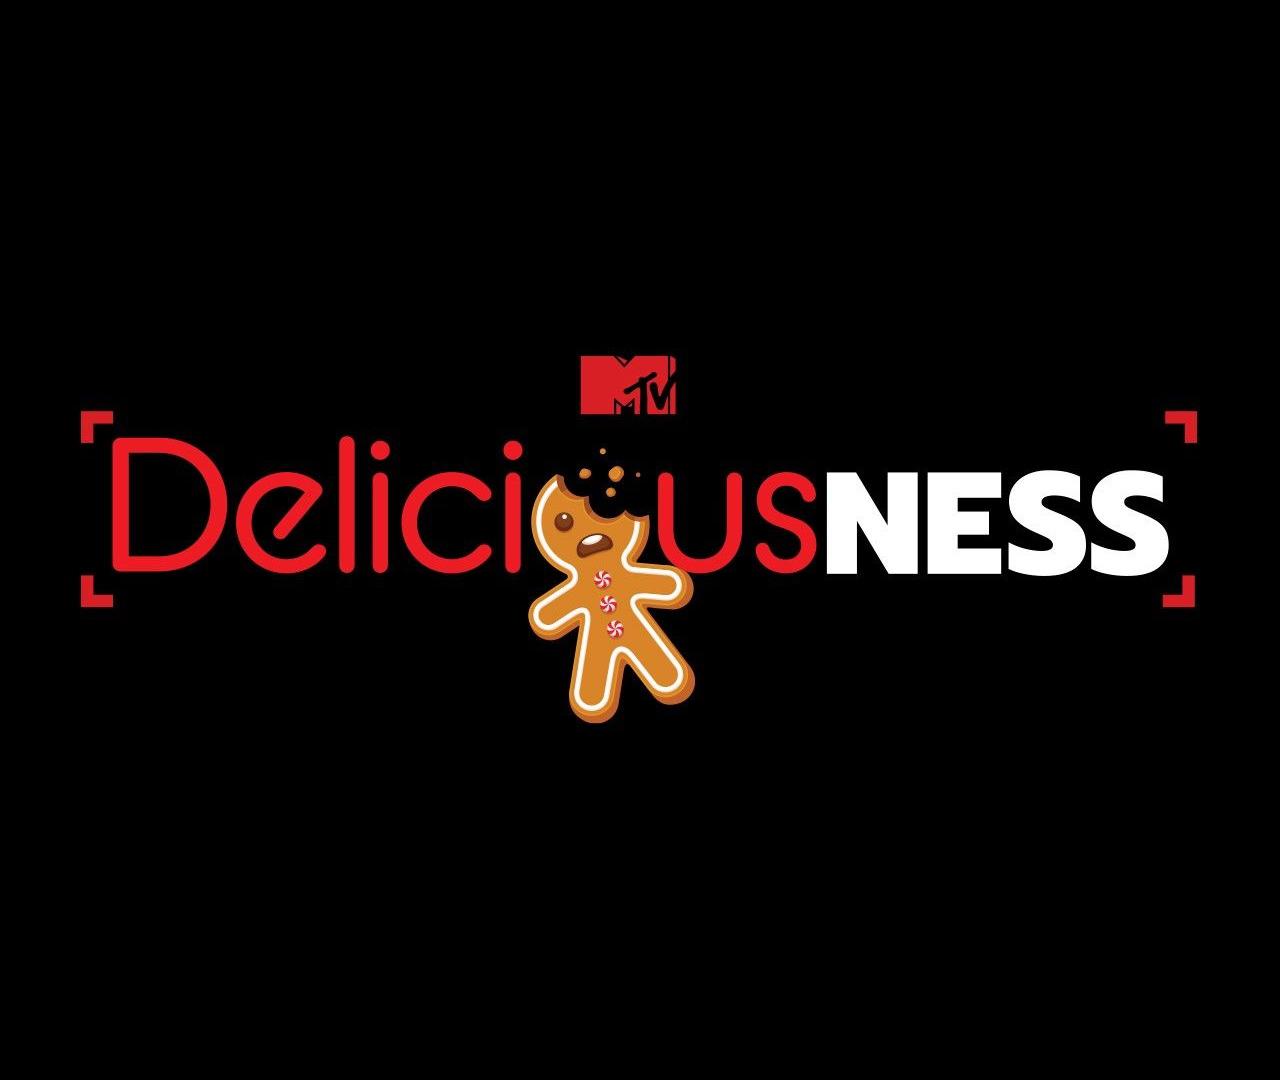 Show Deliciousness